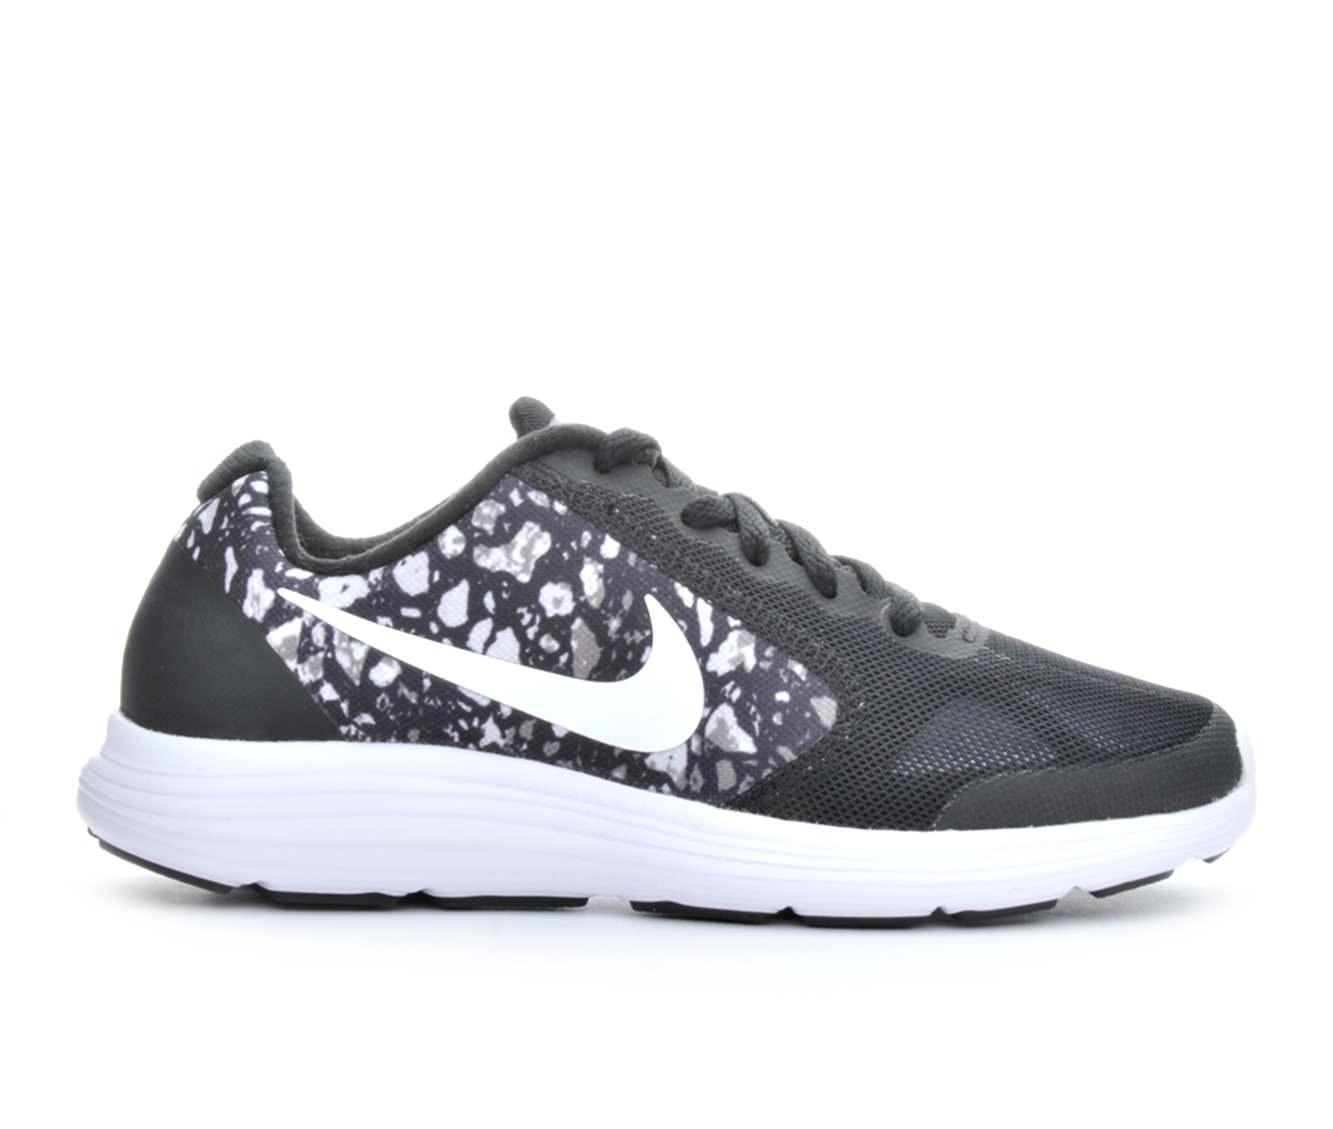 Boys' Nike Revolution 3 Print Running Shoes (Black - Size 3.5 - Big Kid) 1646428